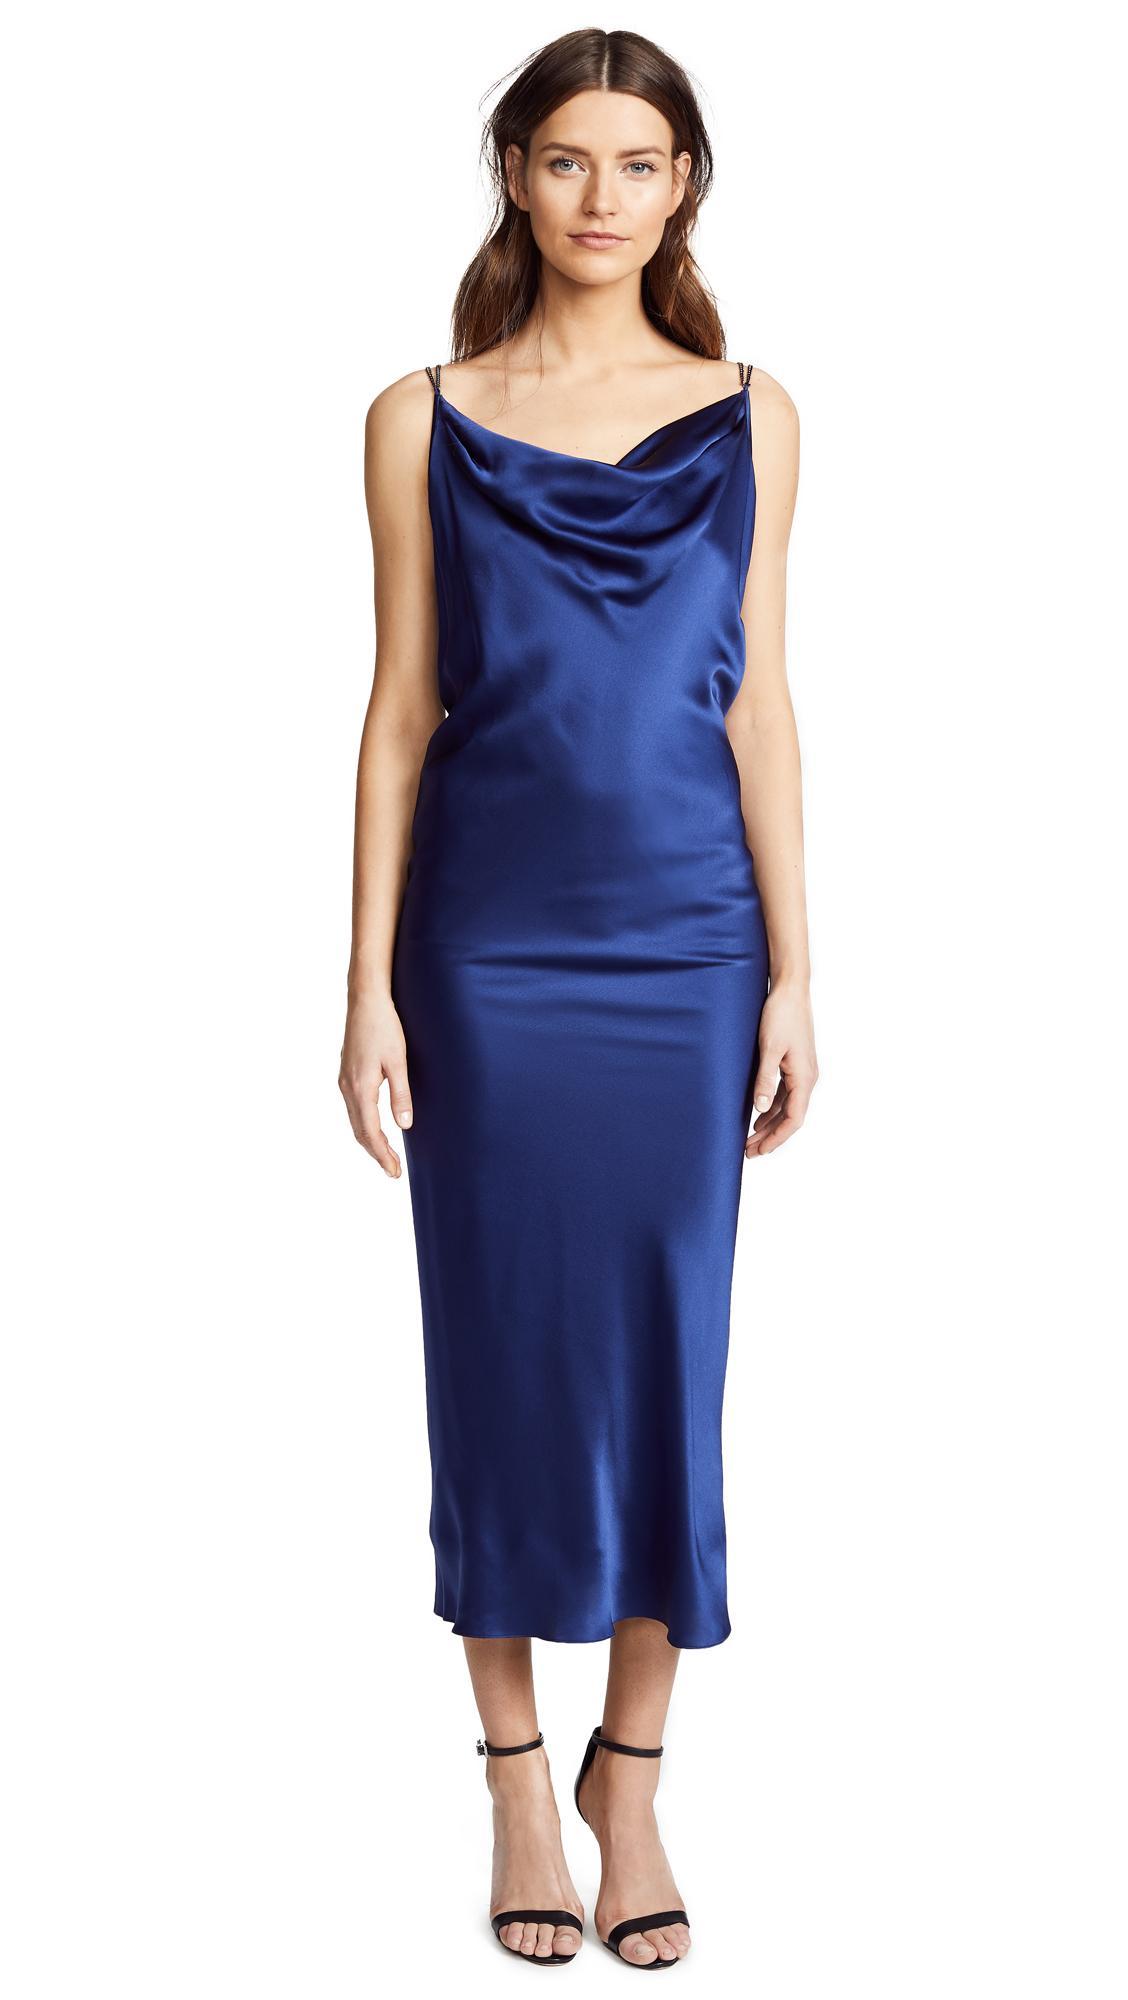 45af29c2c6e9 Vatanika Draped Backless Slip Dress In Blue | ModeSens